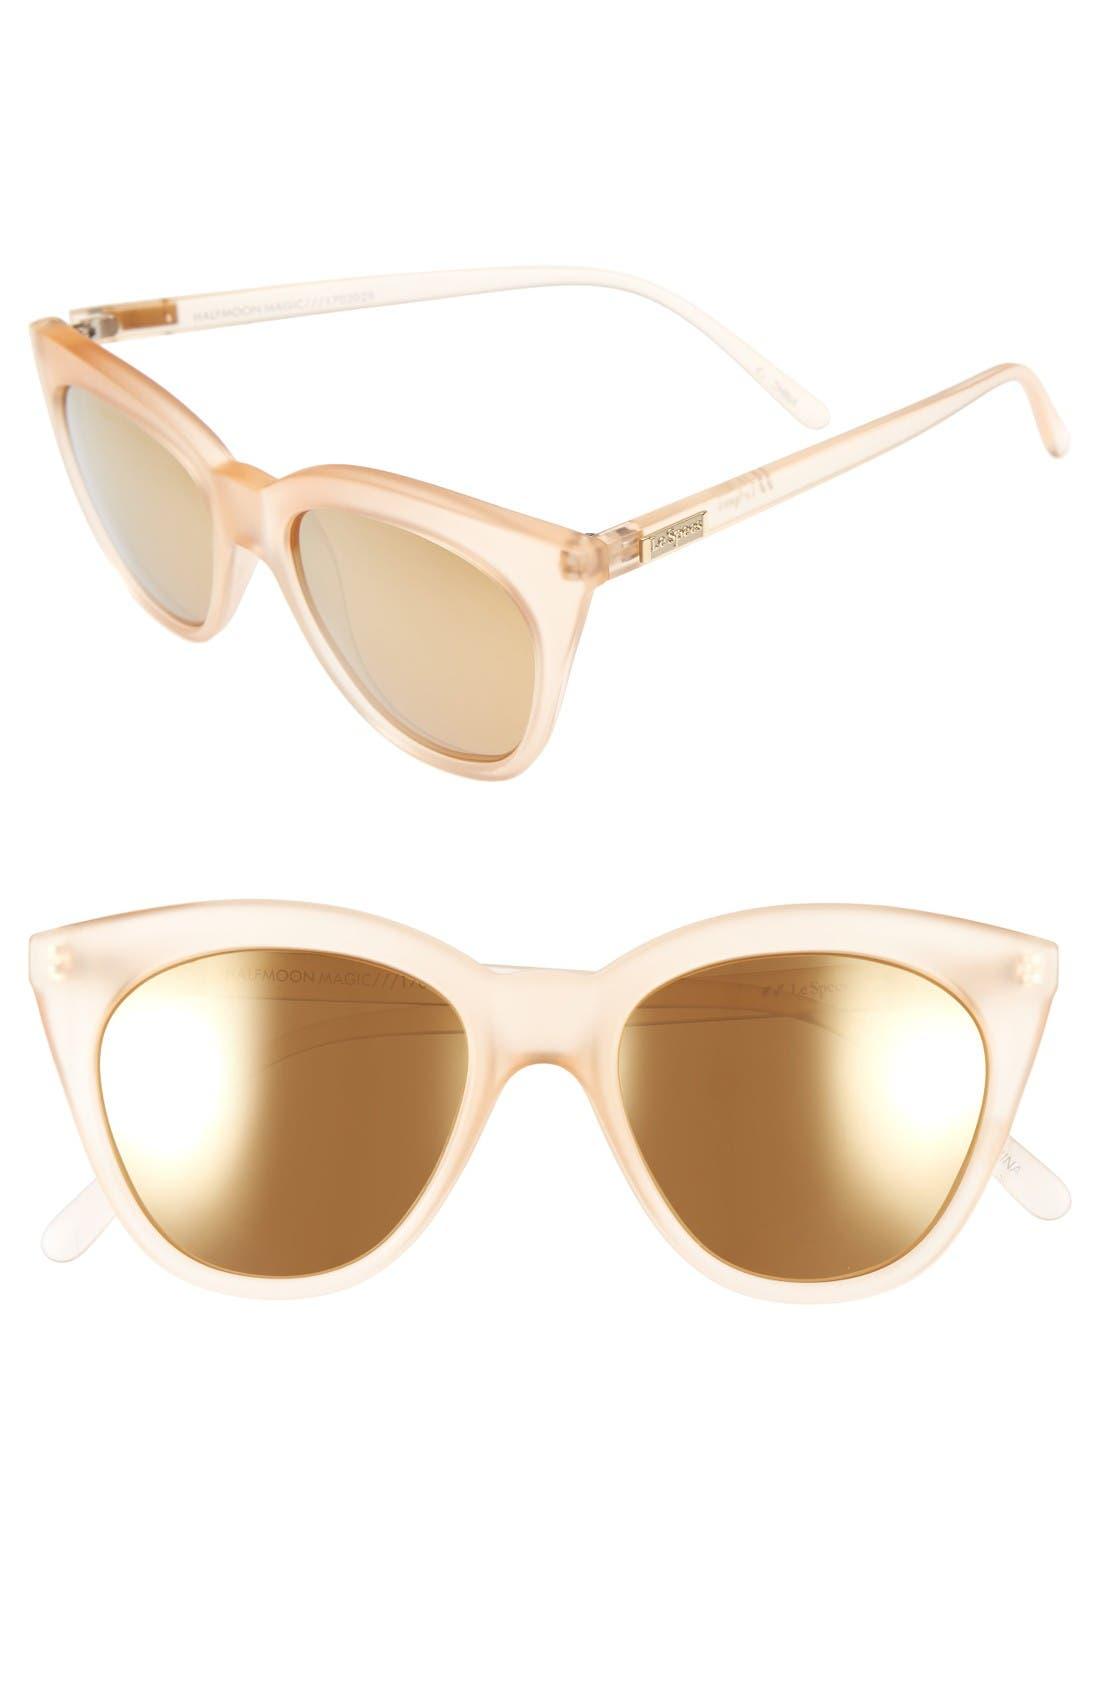 Alternate Image 1 Selected - Le Specs Halfmoon Magic 51mm Cat Eye Sunglasses